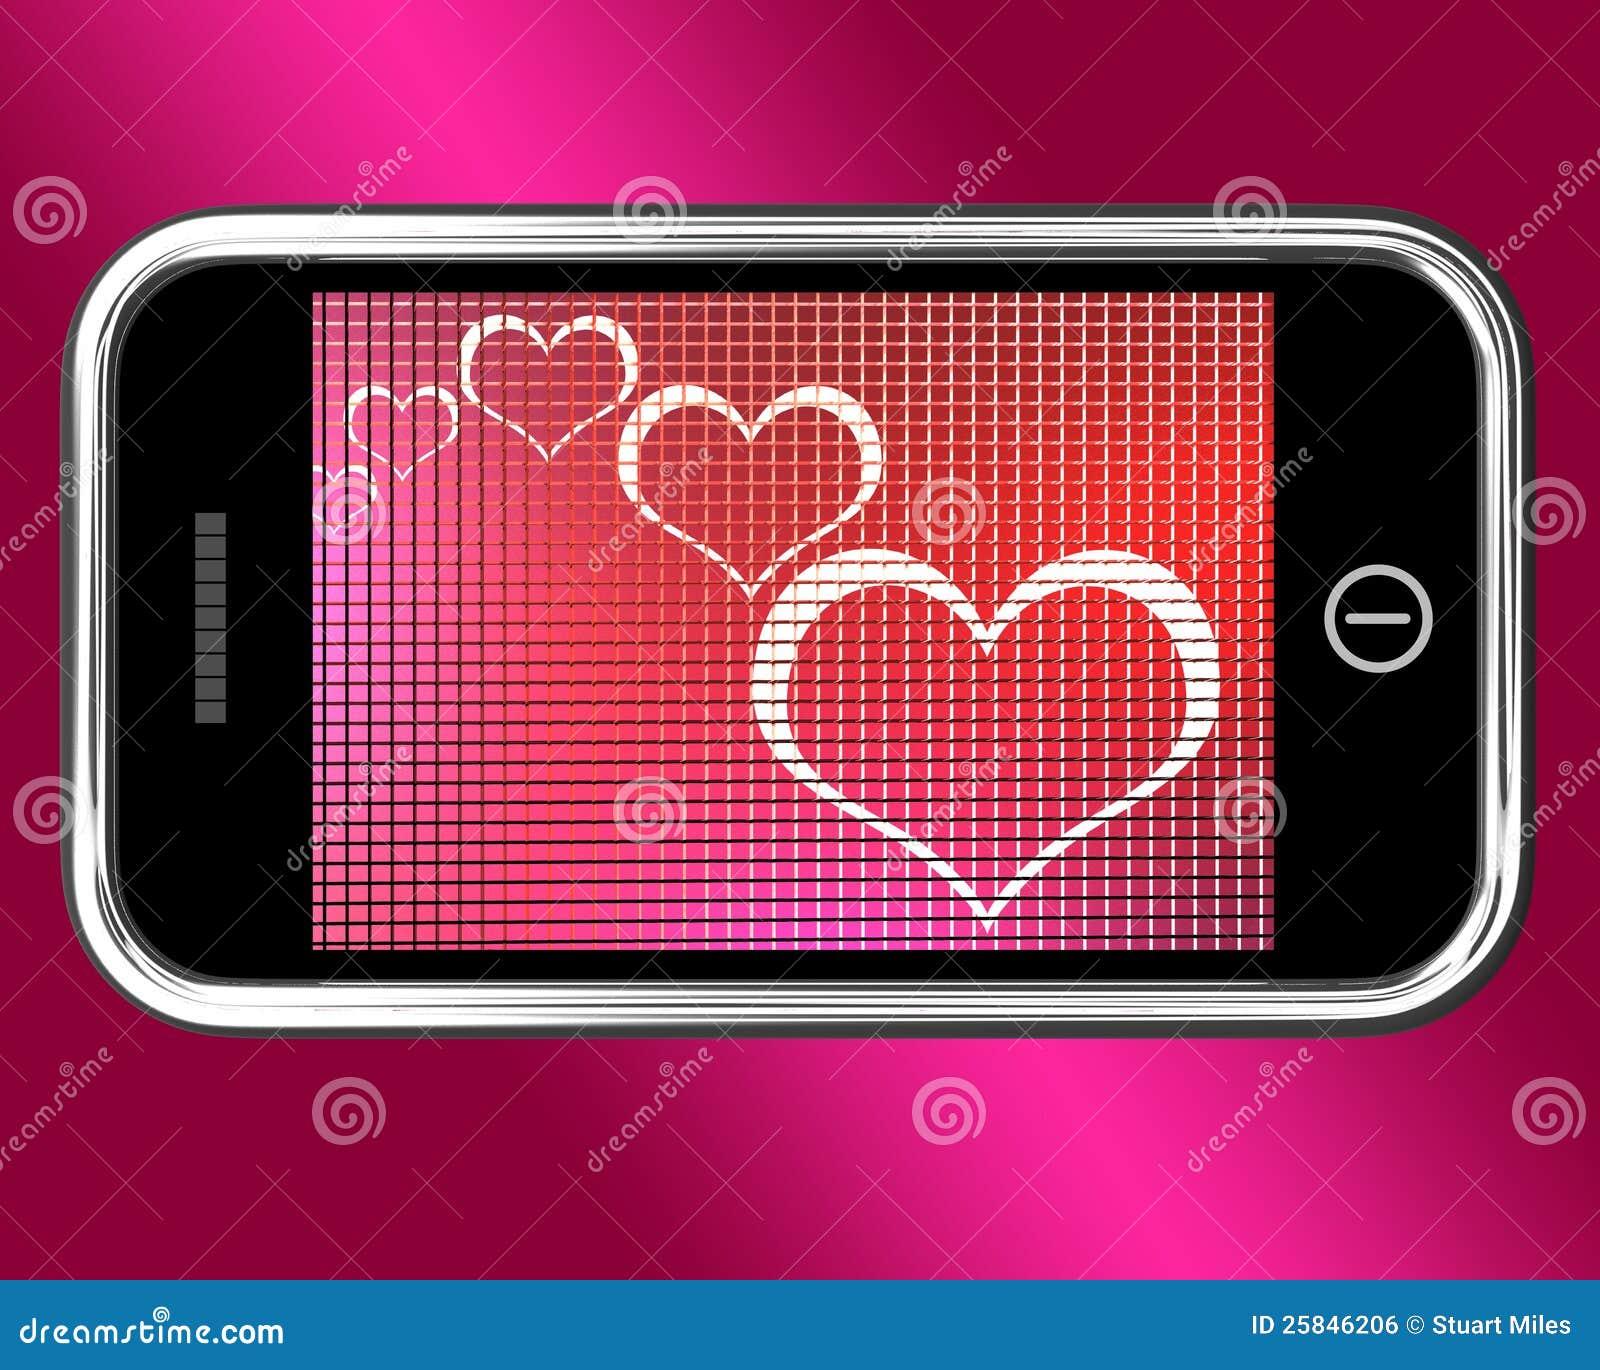 Kezia nobile ebook online dating